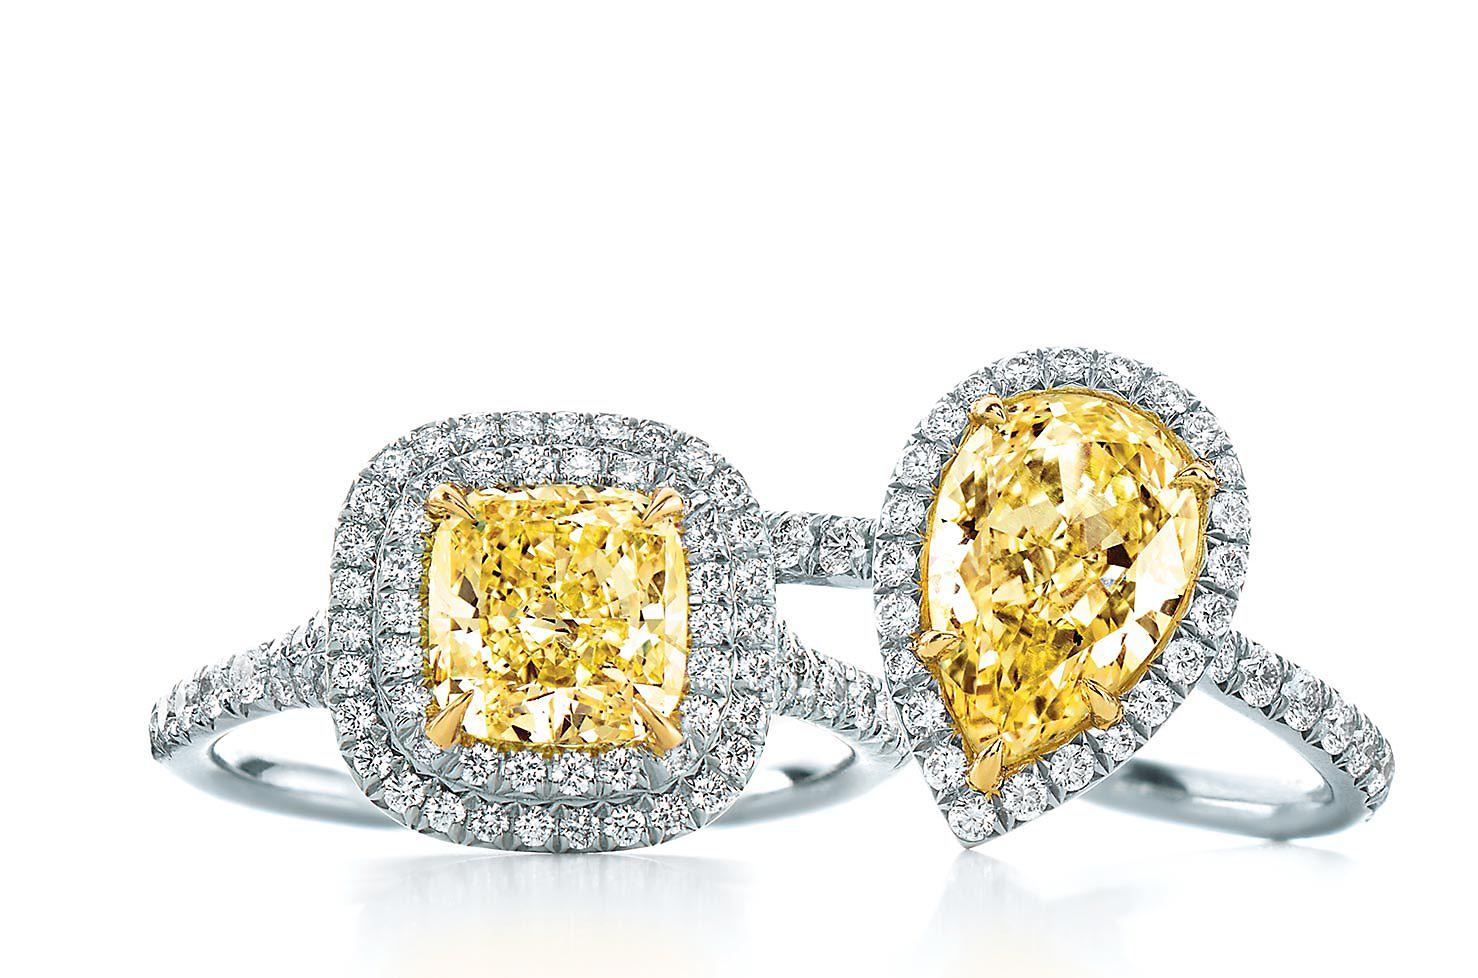 Tiffany Yellow Diamond rings